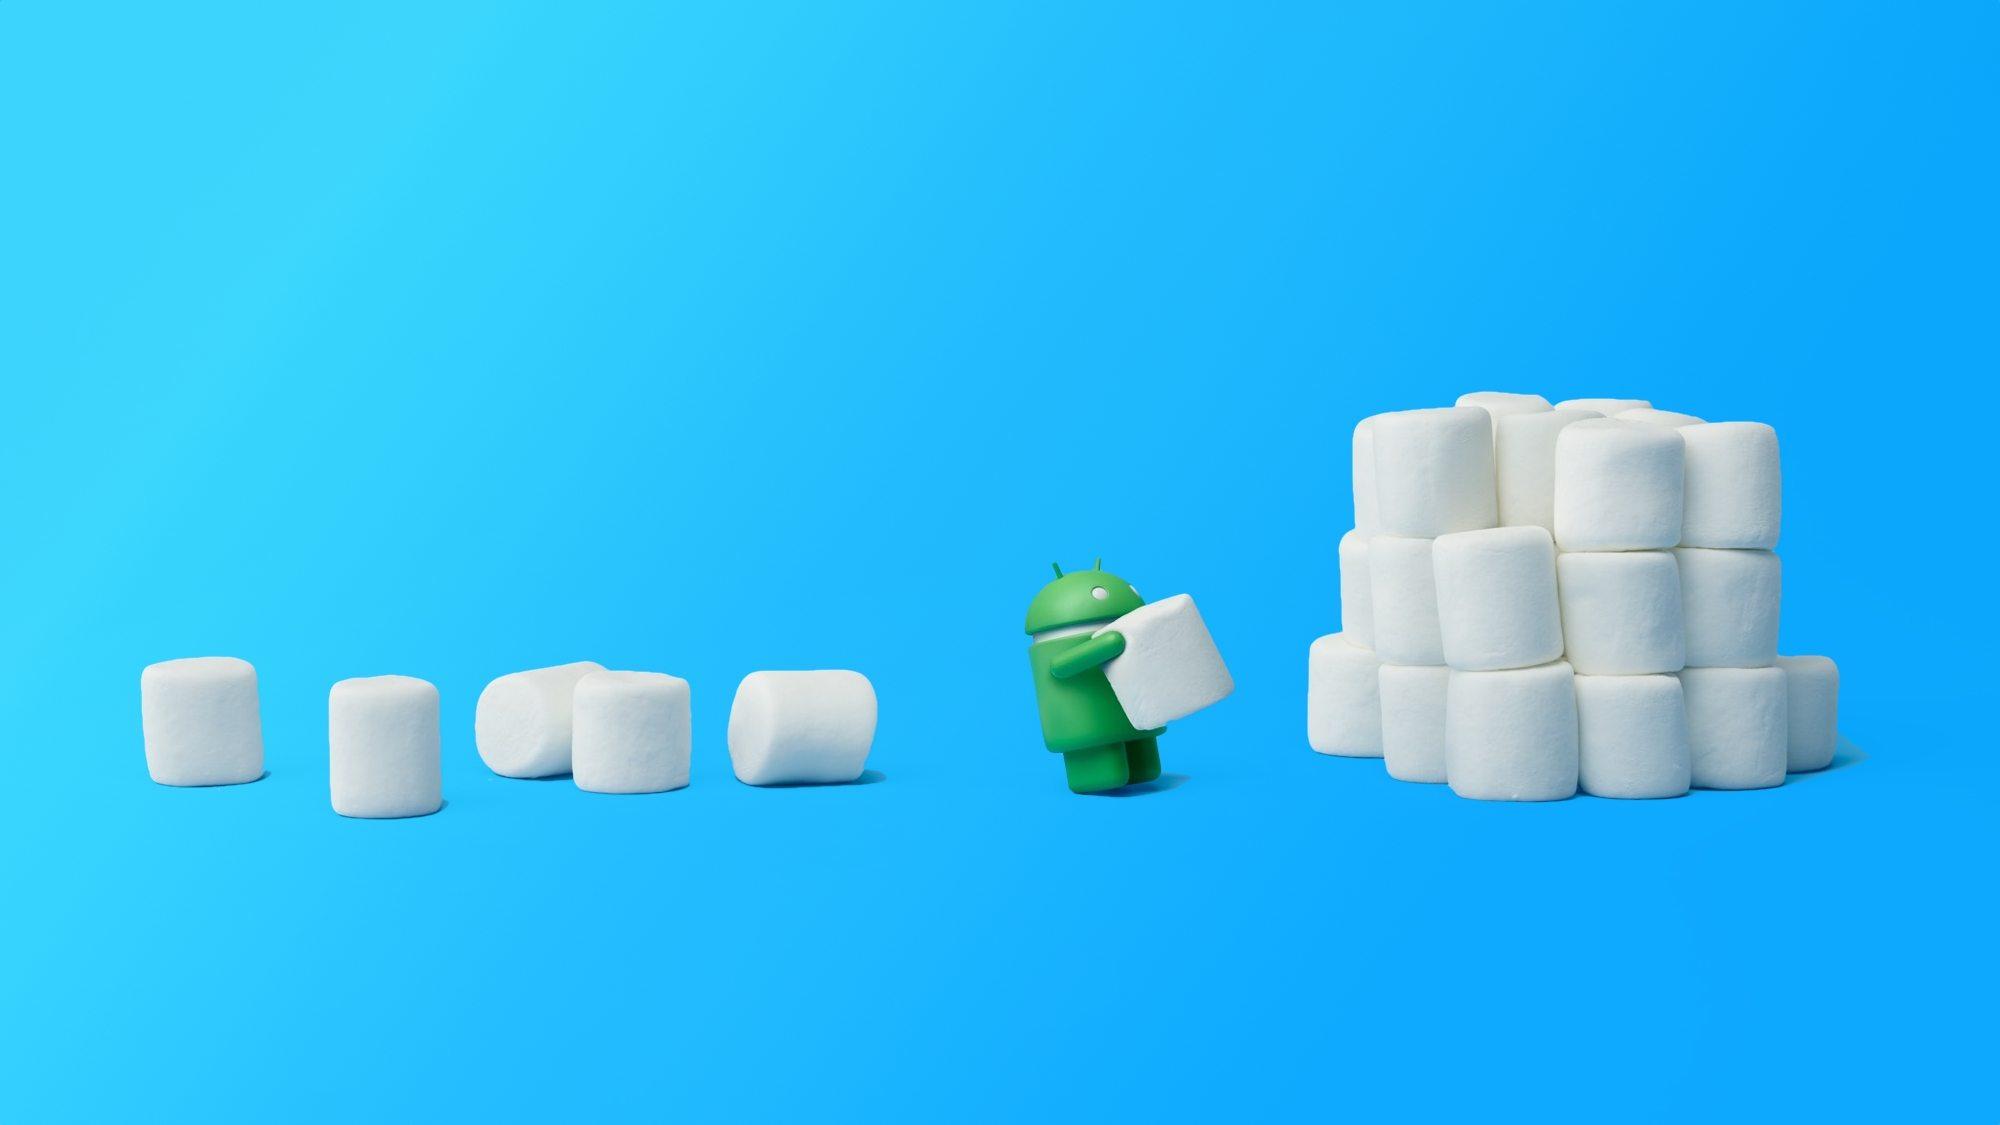 Фото, обновление андроид зефир на Moto G 3 Gen